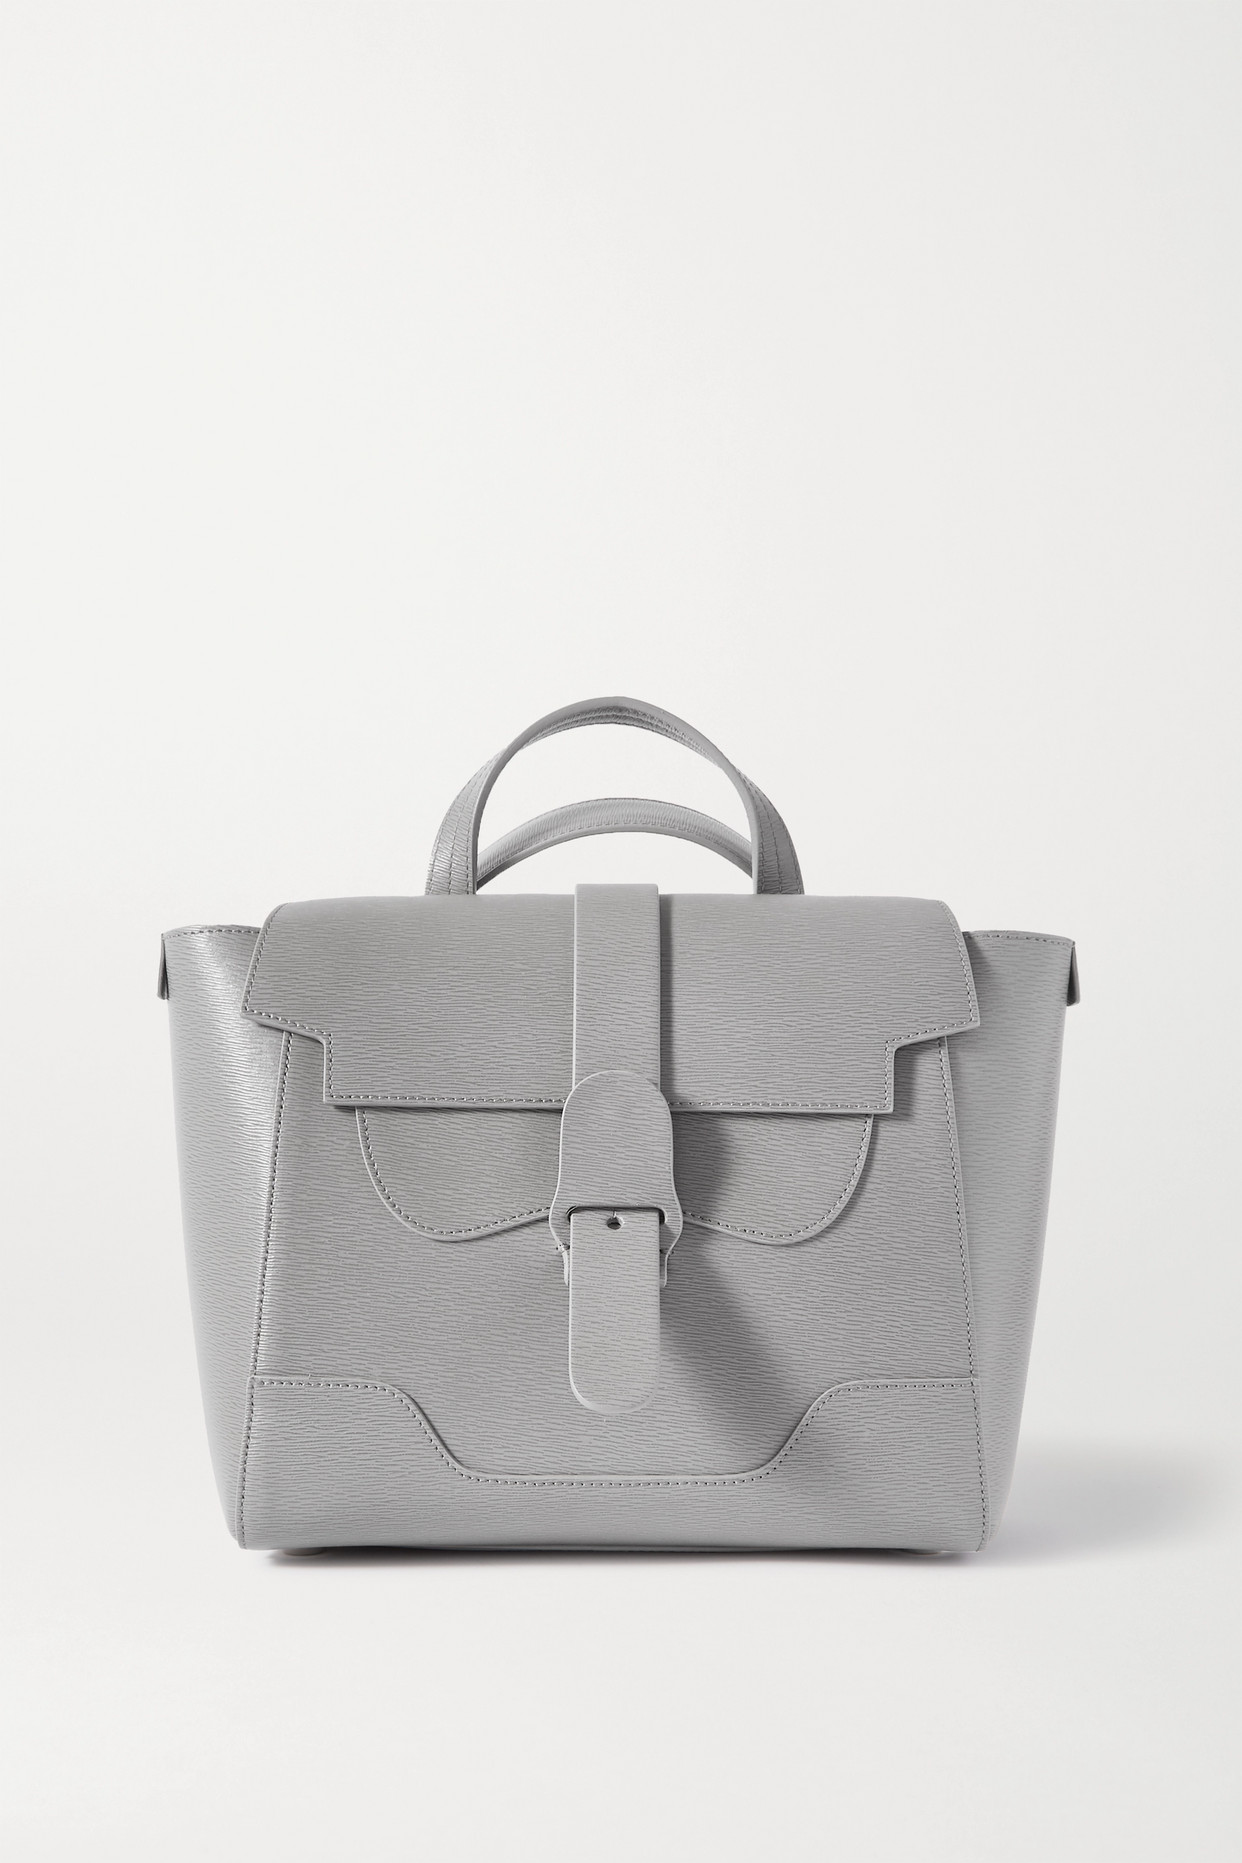 Senreve - Midi Maestra Convertible Textured-leather Shoulder Bag - Gray - one size